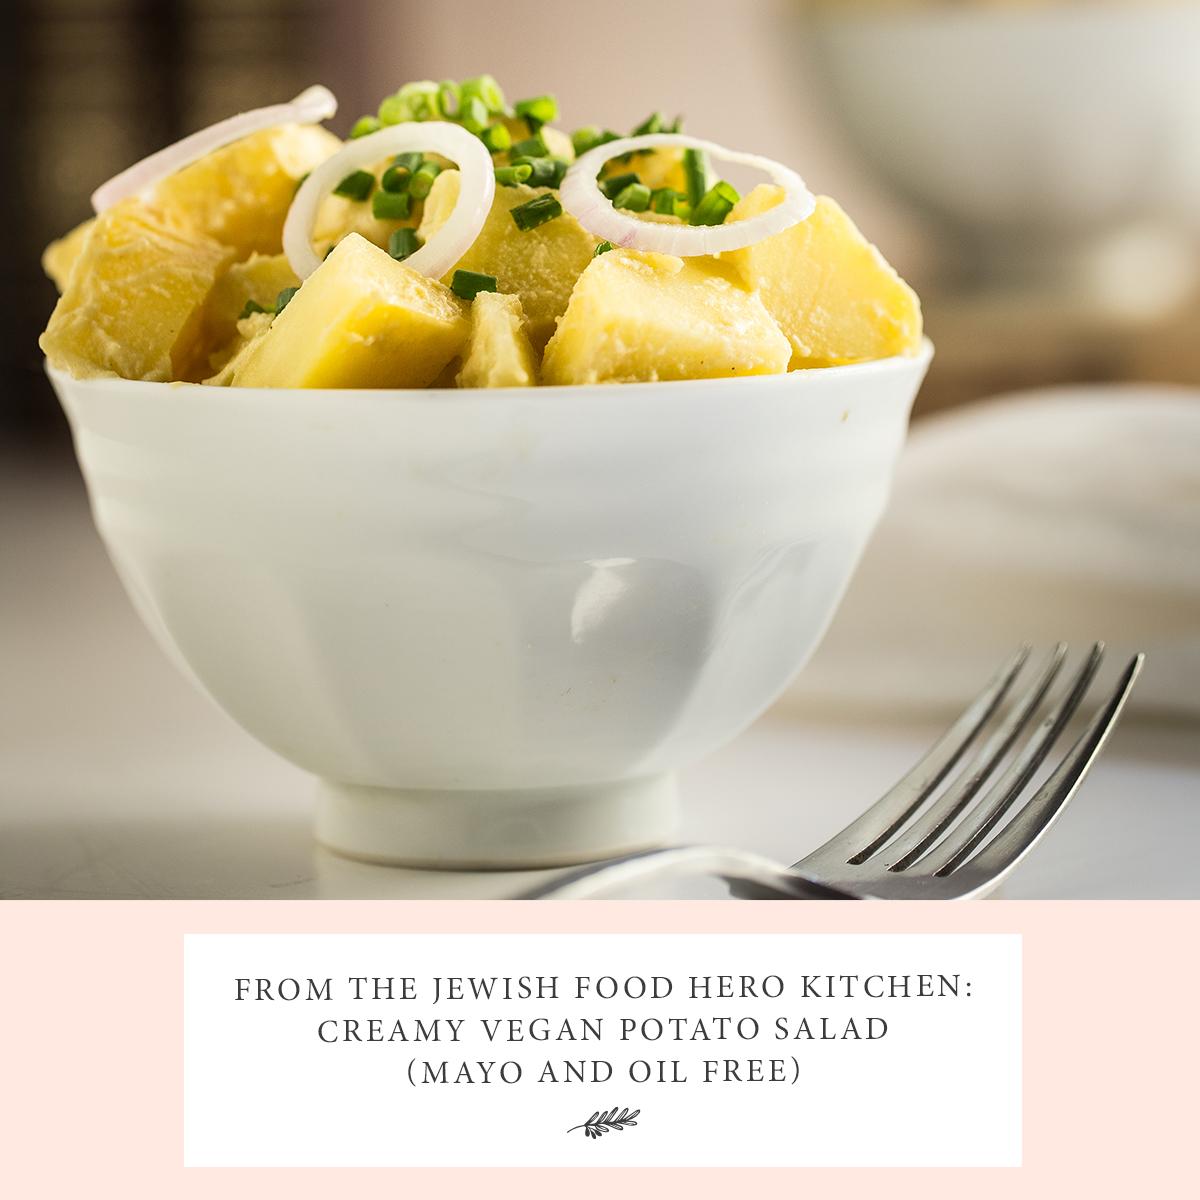 From the Jewish Food Hero Kitchen: Creamy Vegan Potato Salad (Mayo and Oil Free)